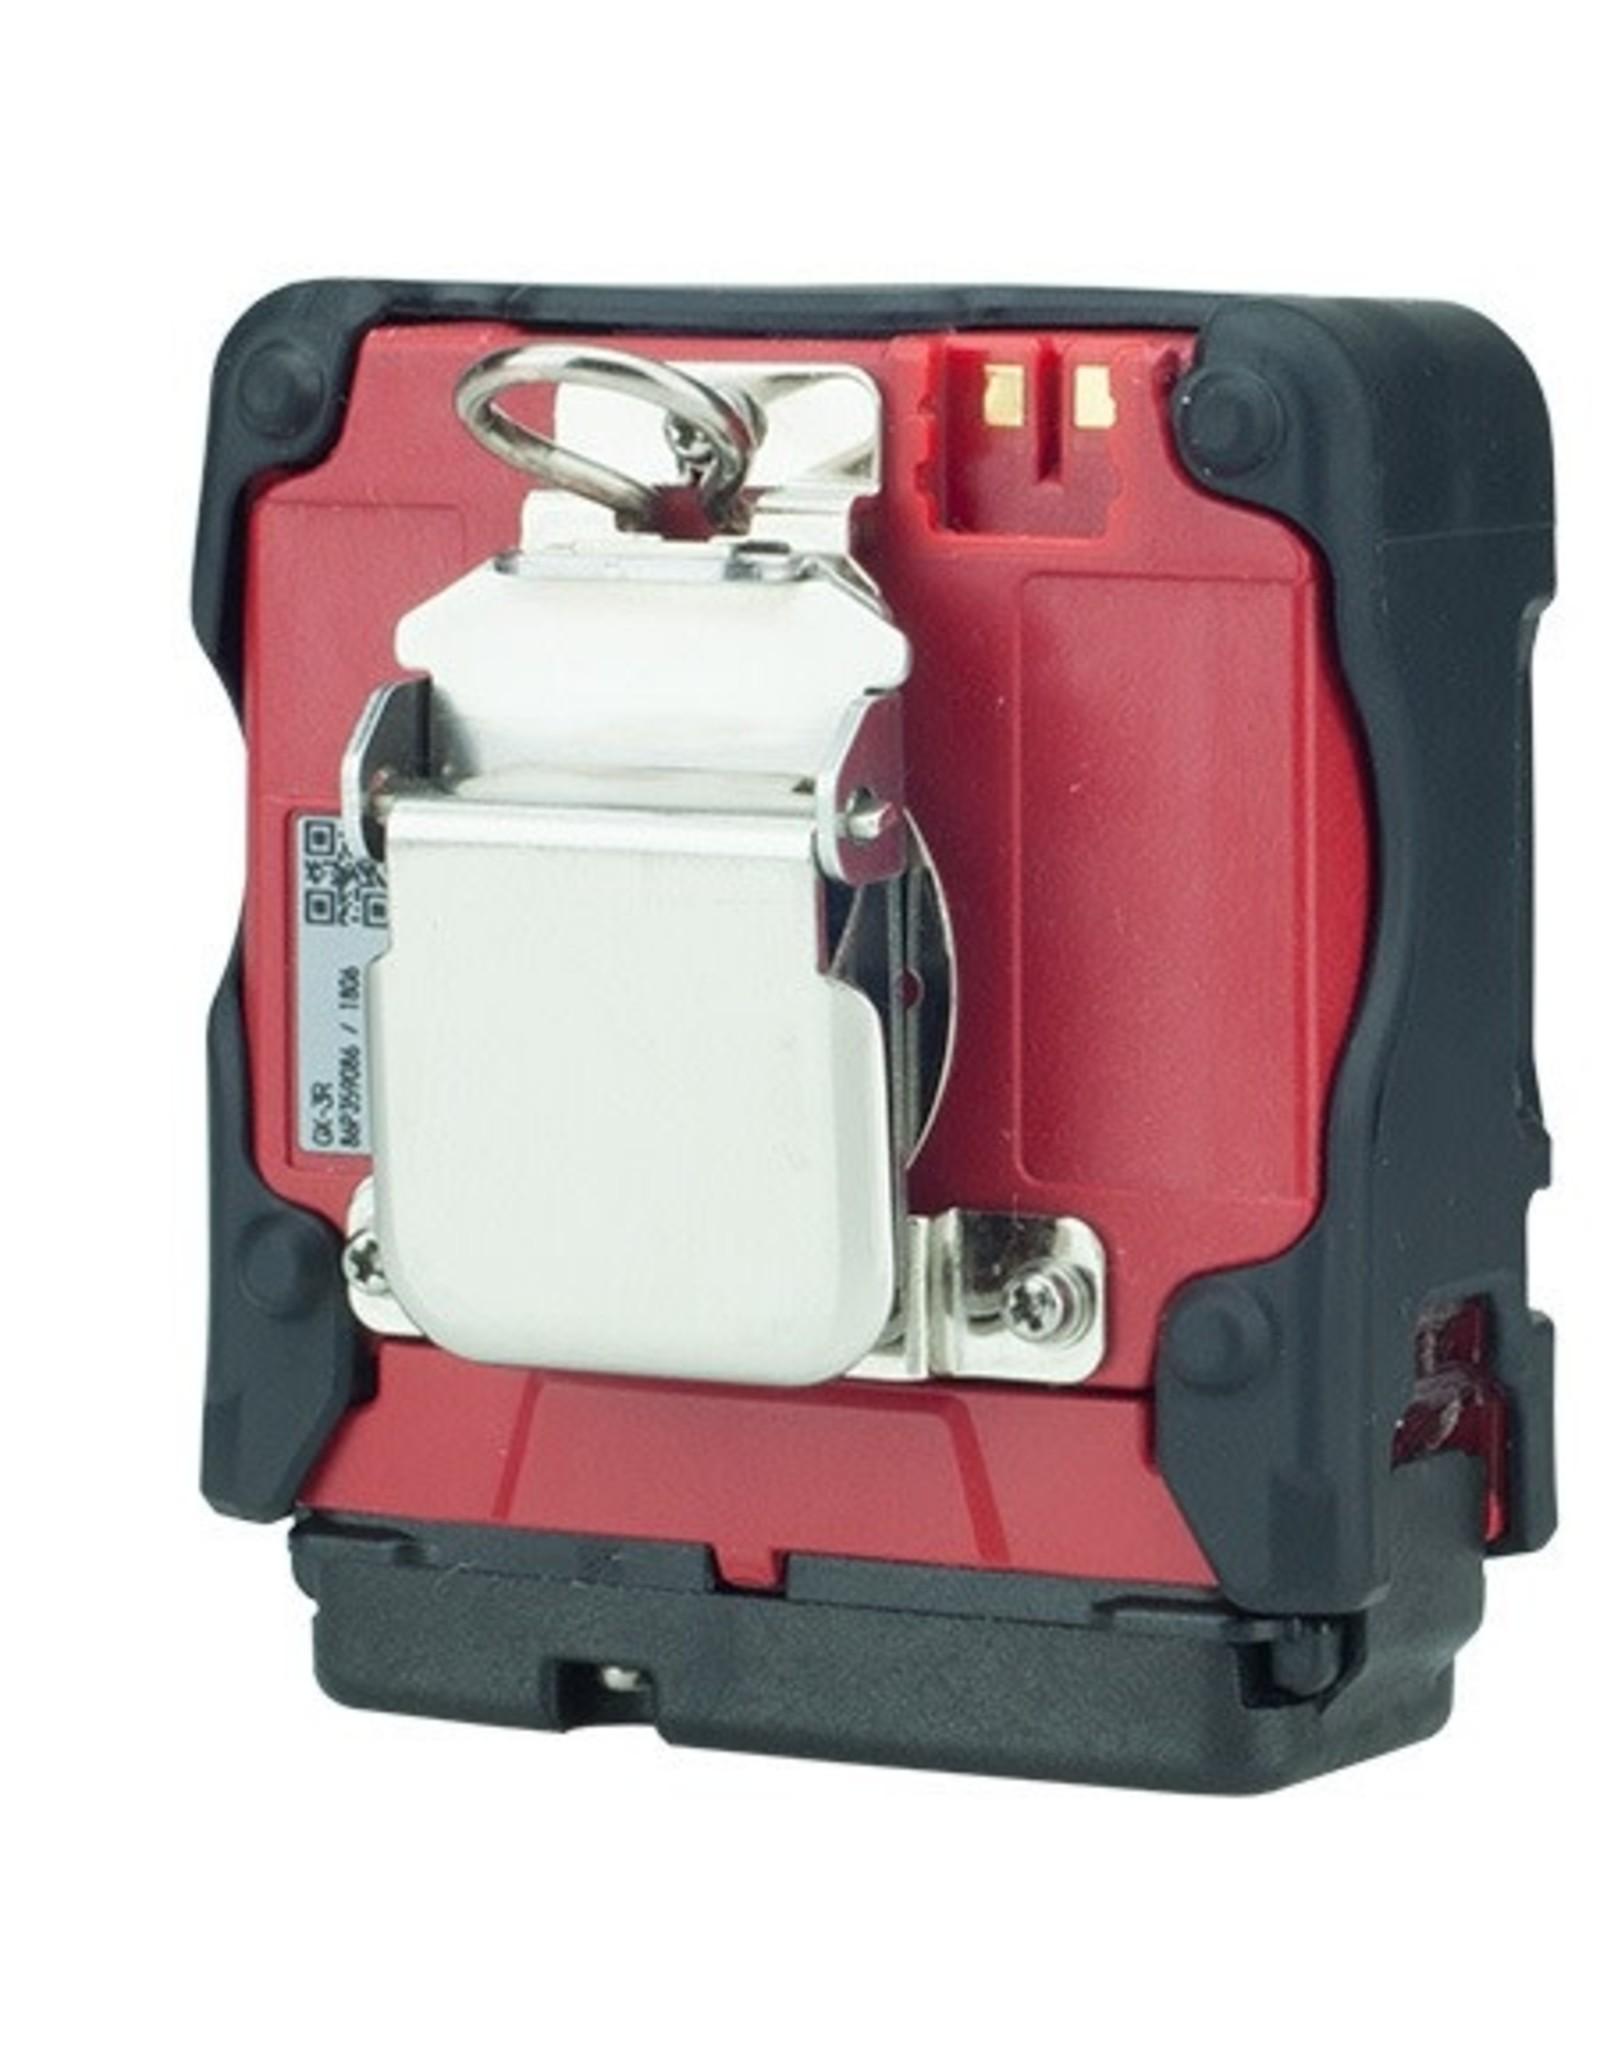 RKI Instruments RKI GX-3R Personal Gas Detector - Confined Space 4 Gas Monitor